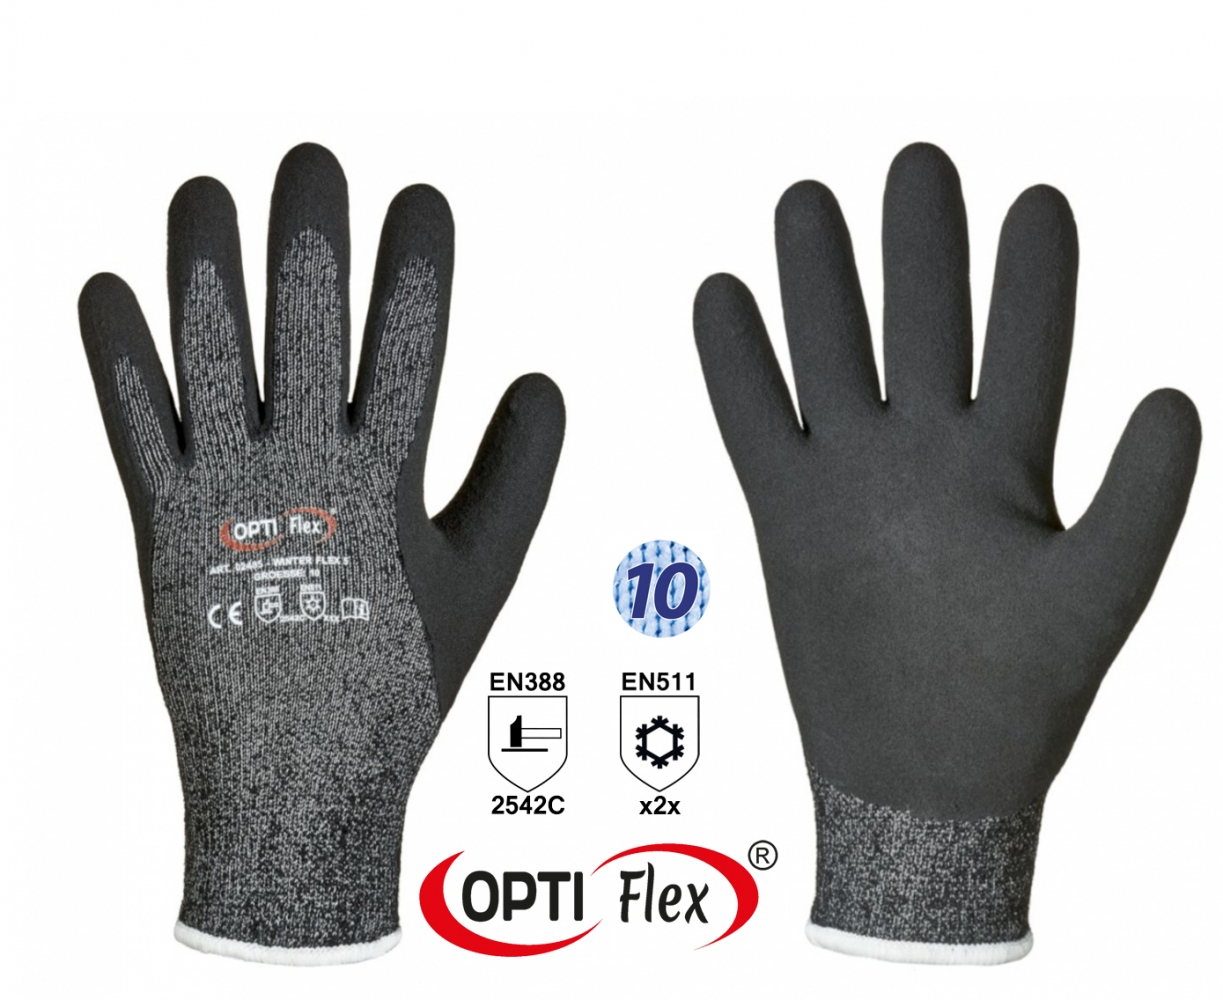 OPTIFlex 02485 WINTER FLEX 5 Premium cut resistant gloves